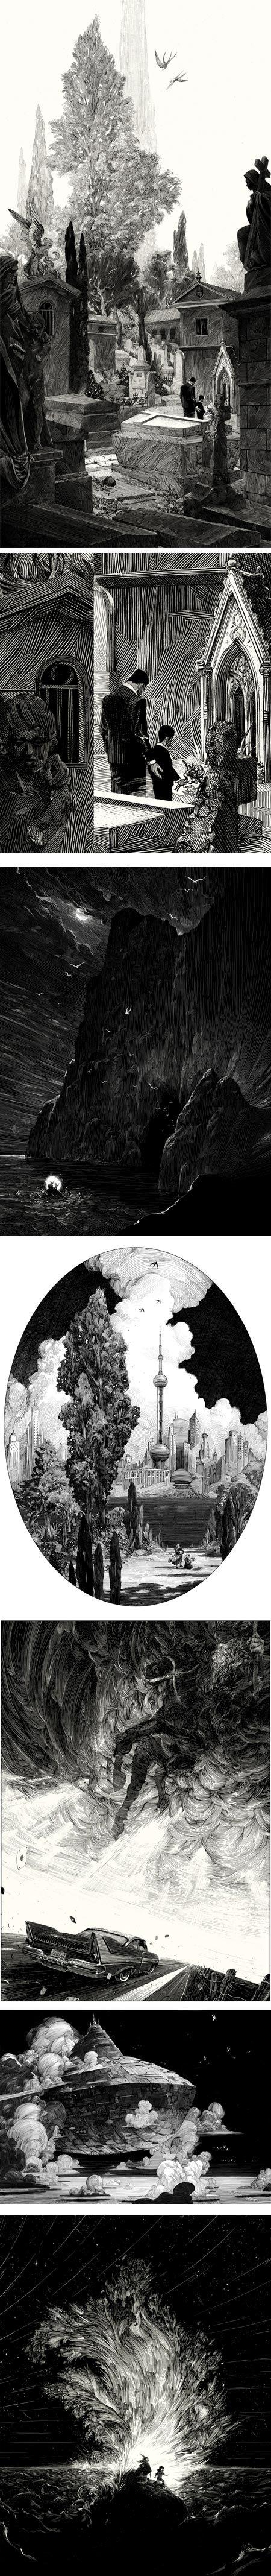 Nicolas Delort, a freelance illustrator based in Paris, creates wonderfully textural pen & ink (on scratchboard) illustrations